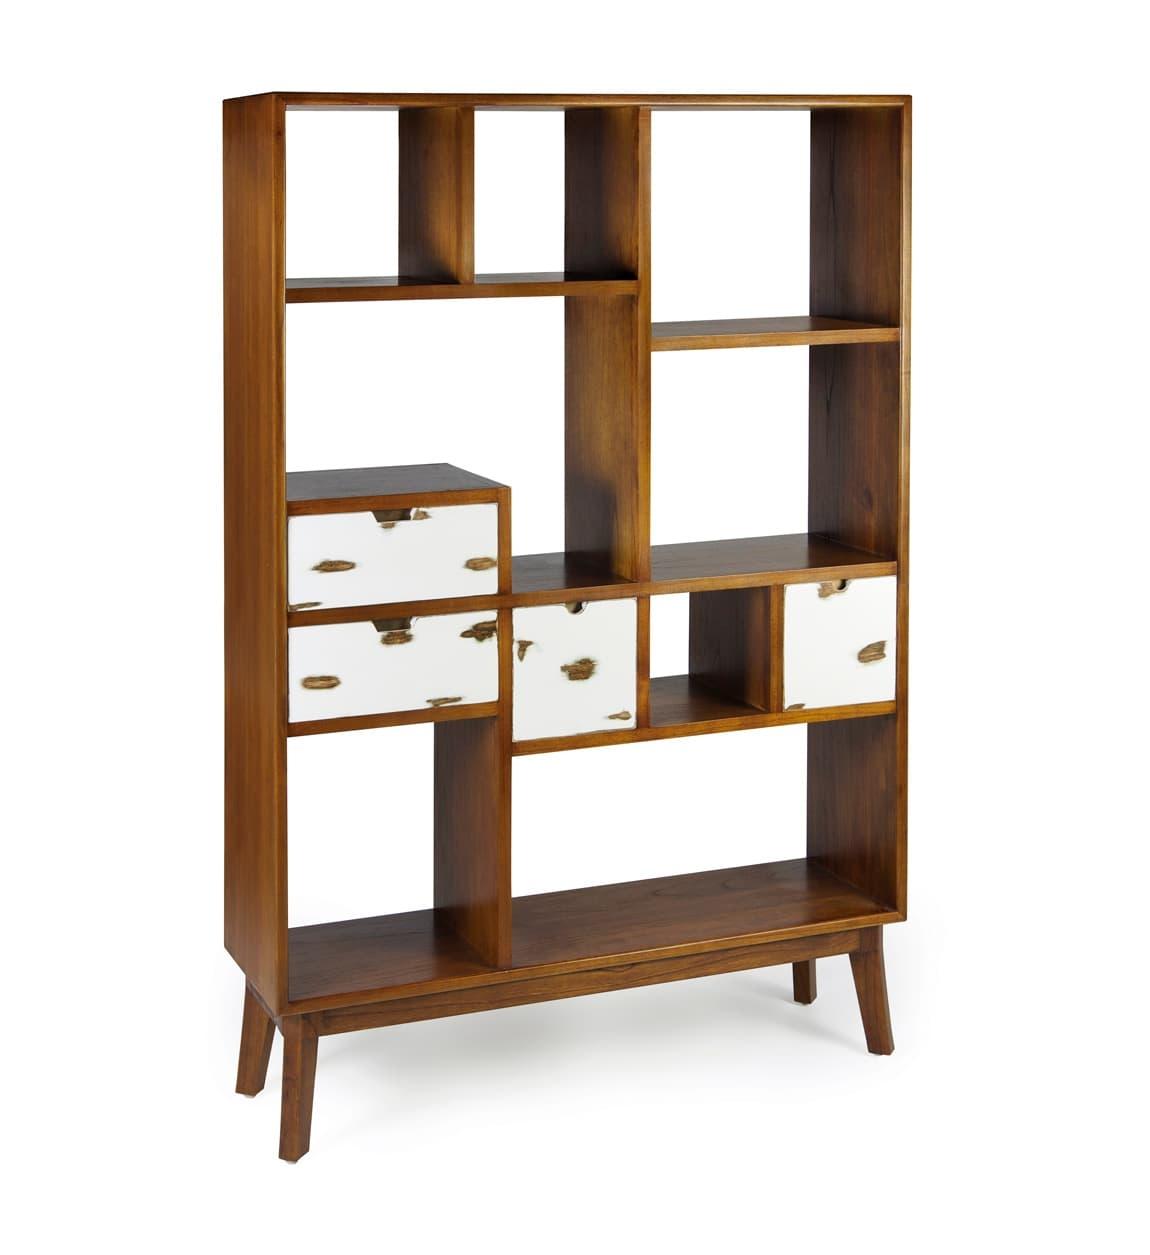 Biblioteca din lemn cu 4 sertare, Nordic Nuc / Alb, l120xA35xH180 cm somproduct.ro